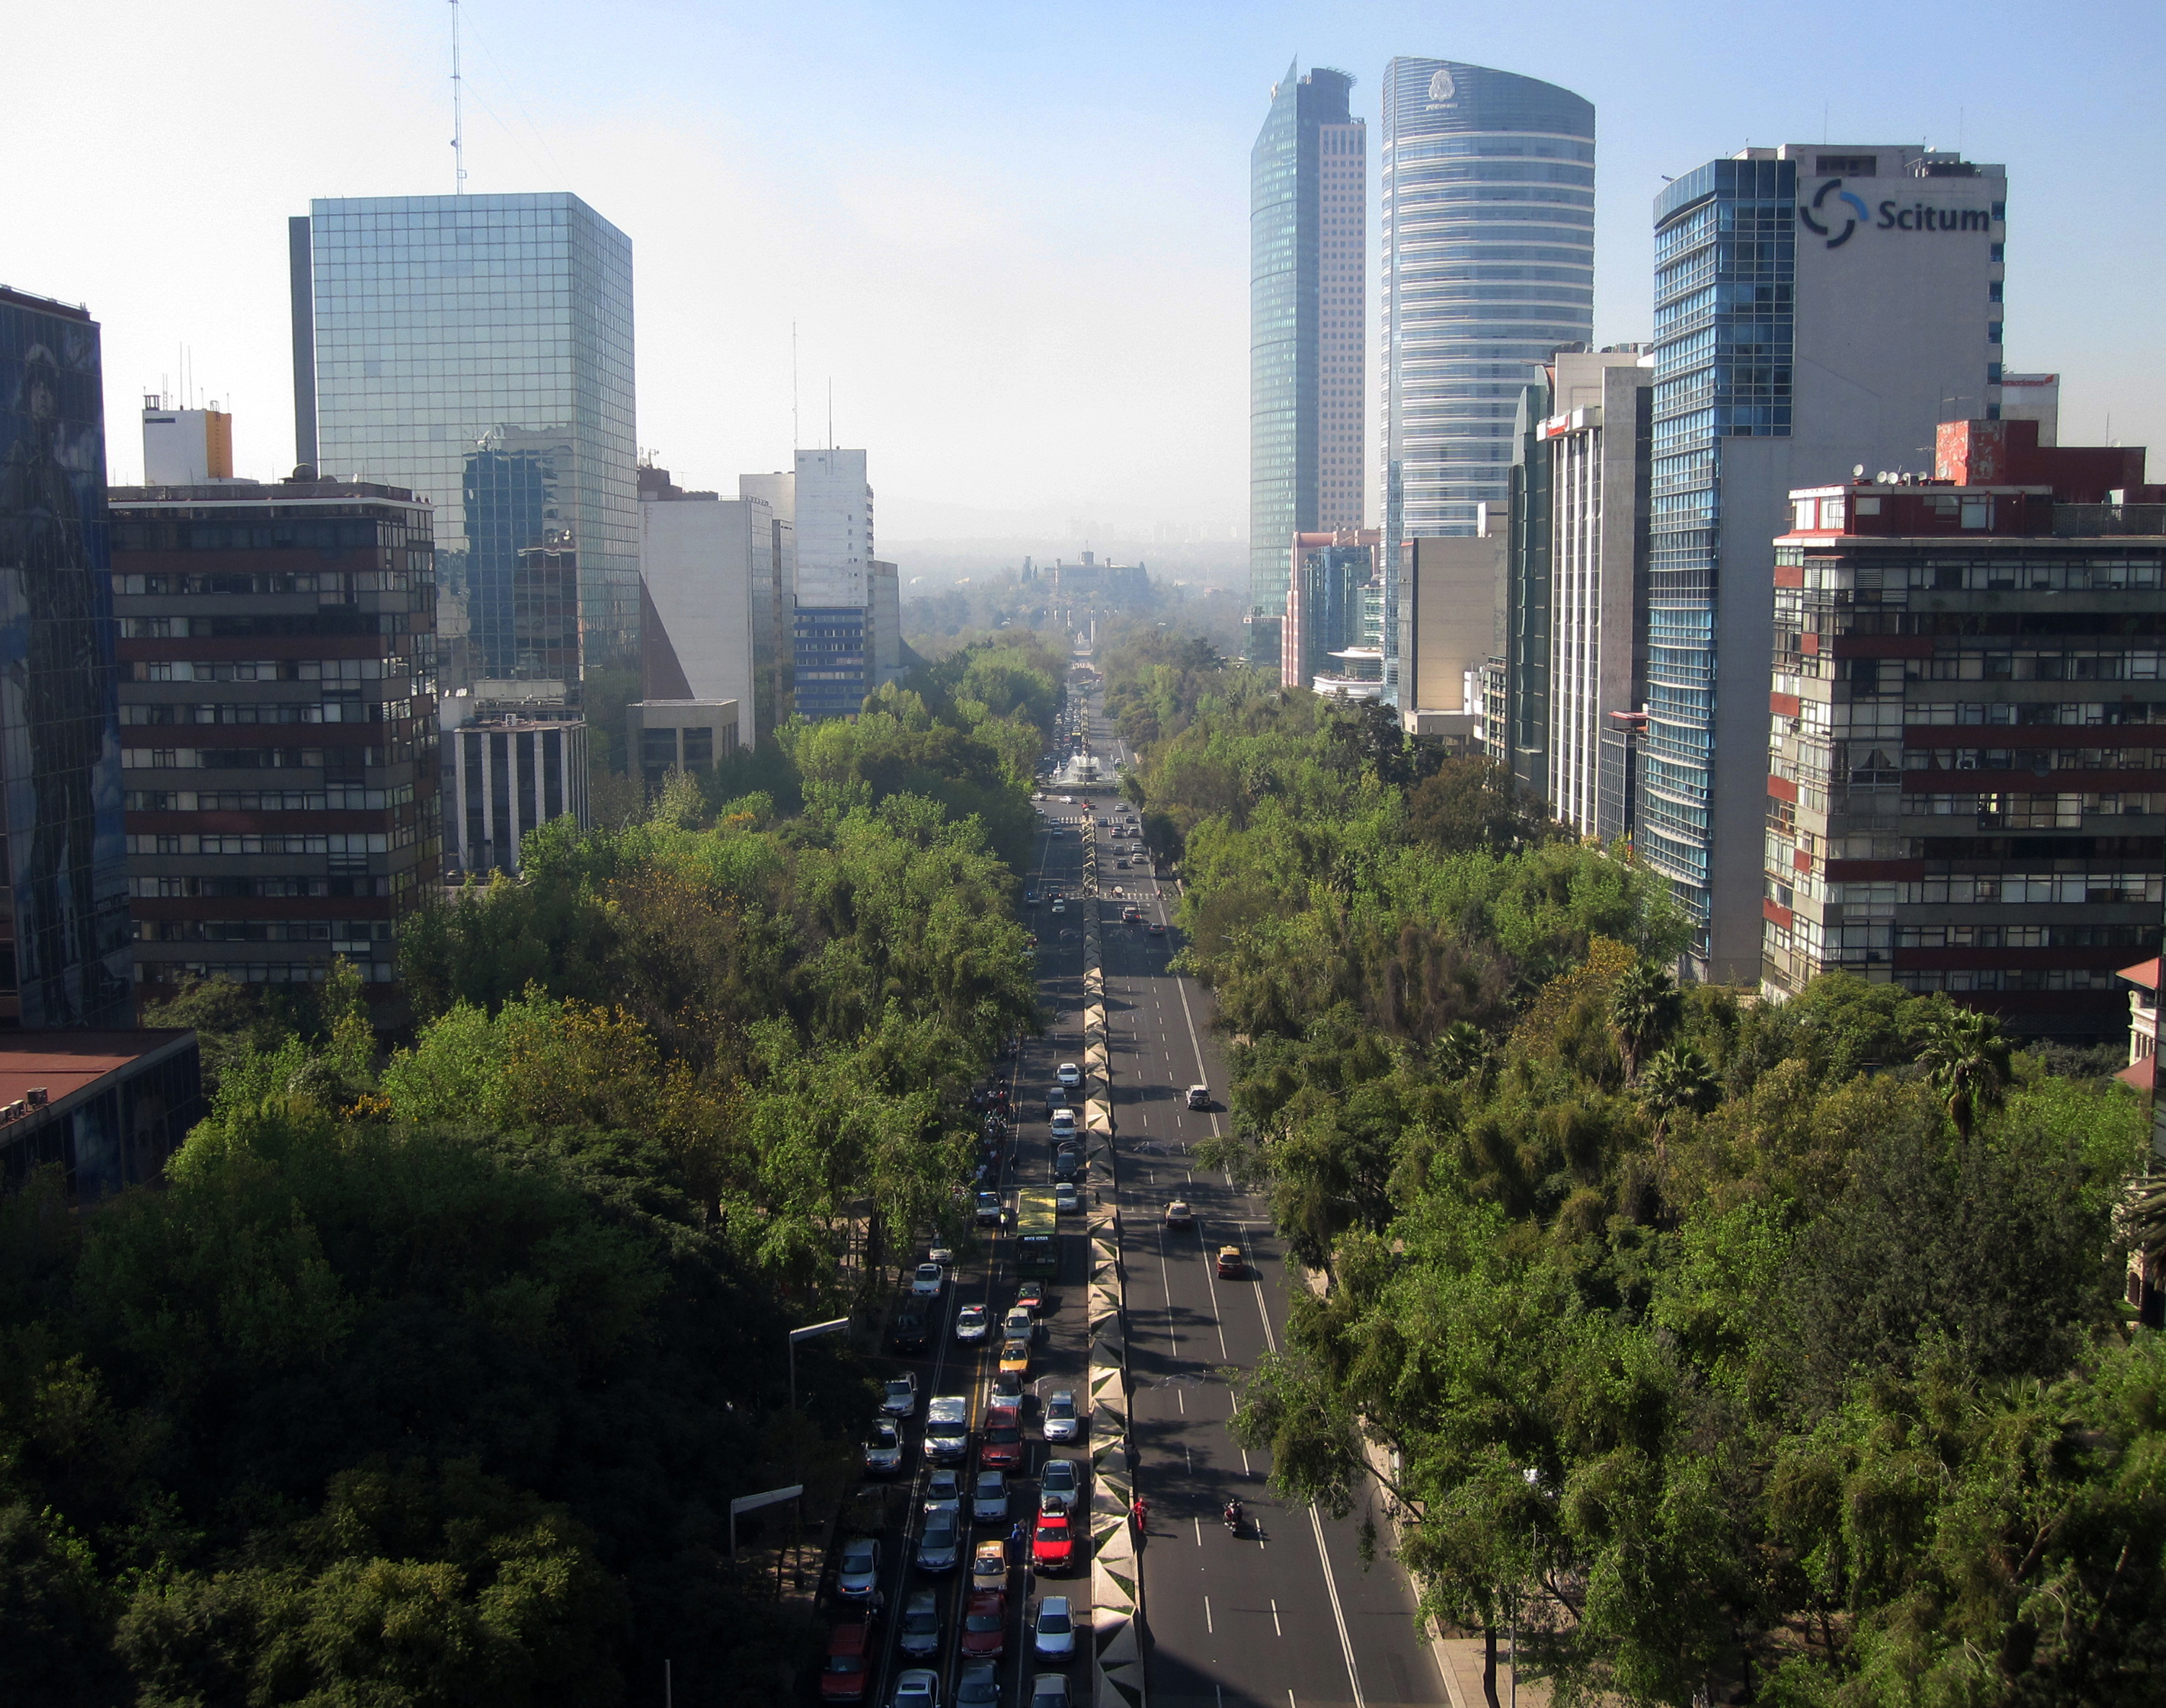 Paseo_de_la_Reforma_1.jpg